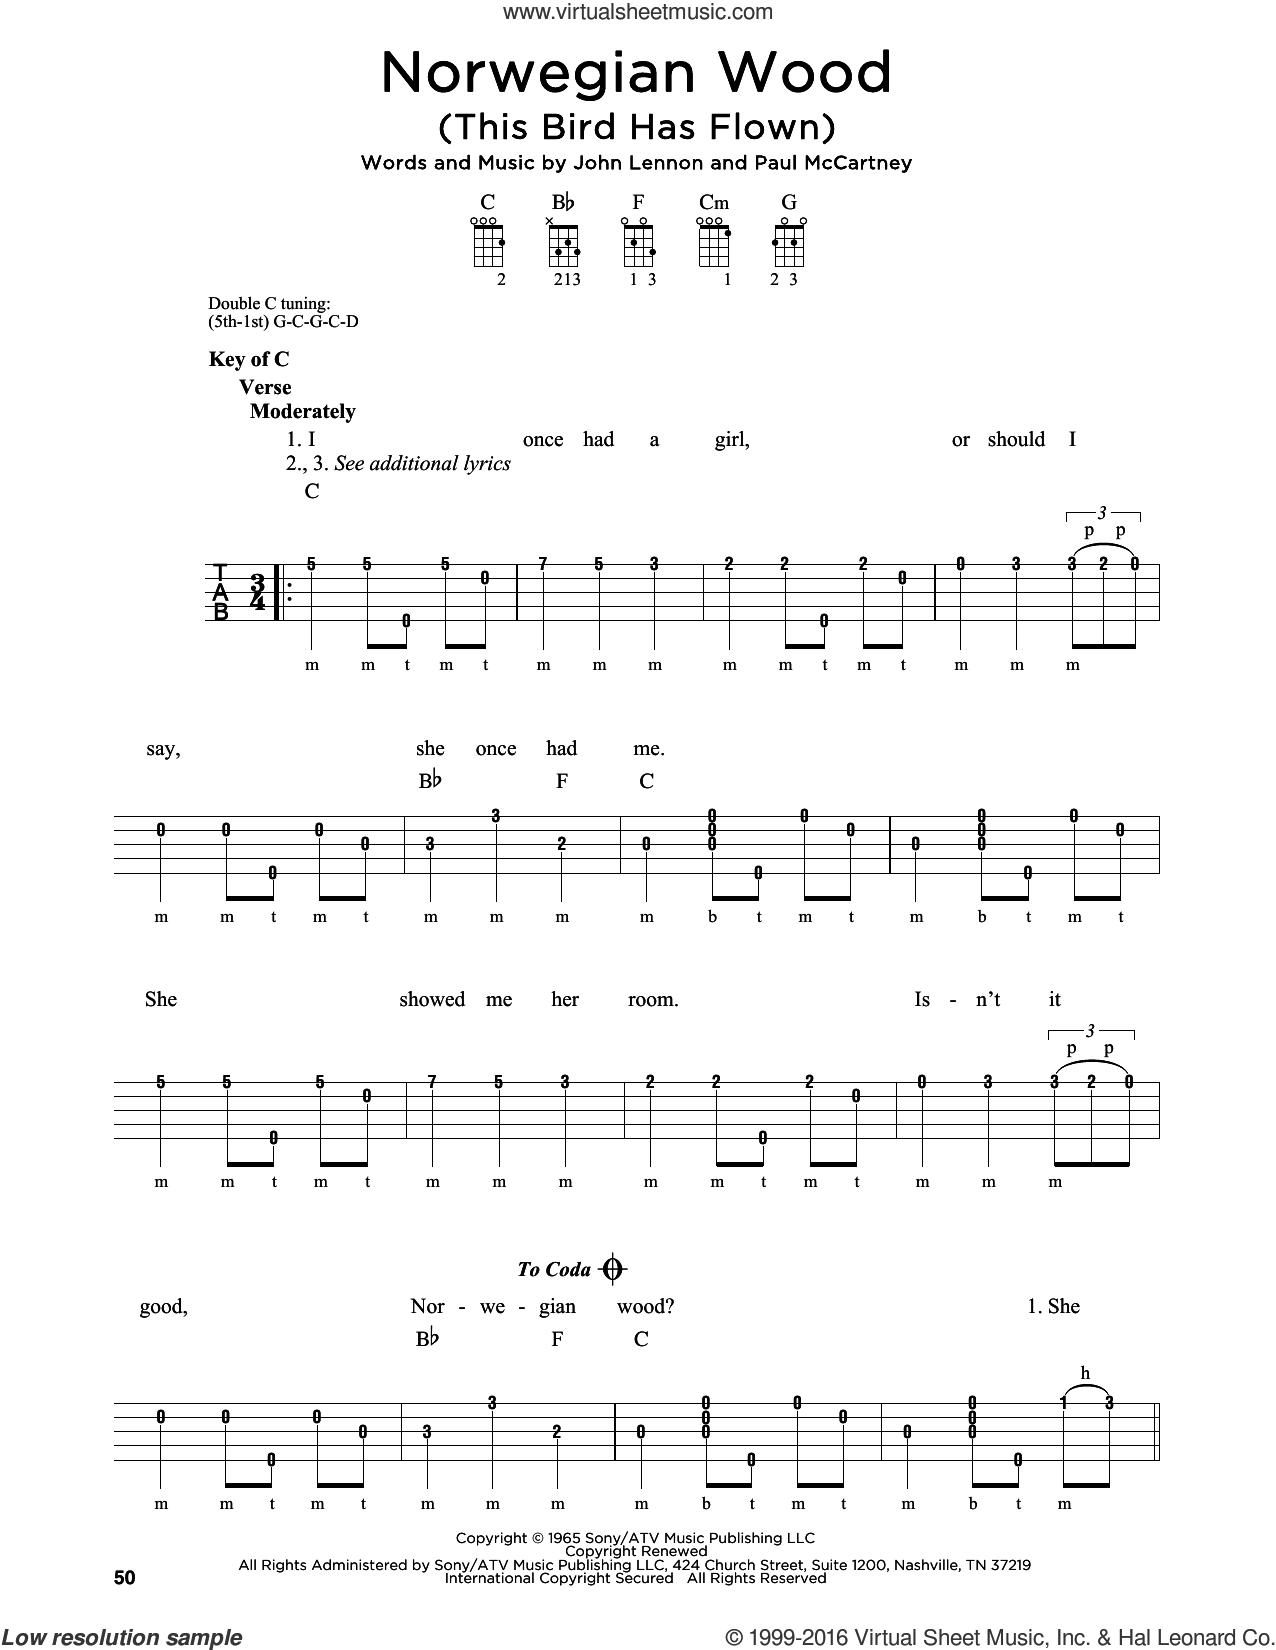 Norwegian Wood (This Bird Has Flown) sheet music for banjo solo by The Beatles, John Lennon and Paul McCartney, intermediate skill level